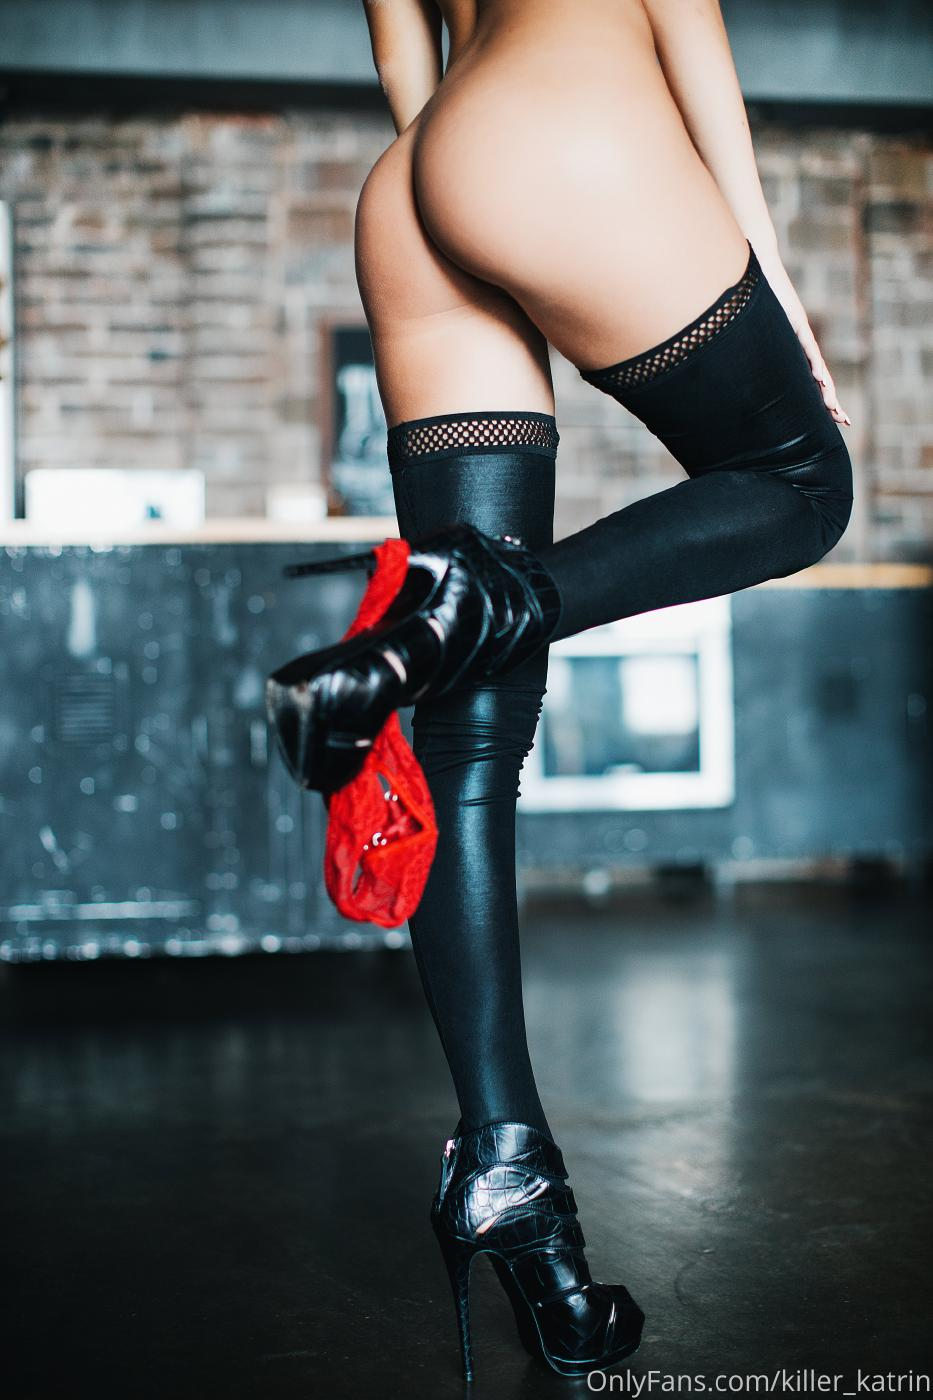 Killer Katrin Topless Bar Strip Onlyfans Set Leaked Ndxiwh